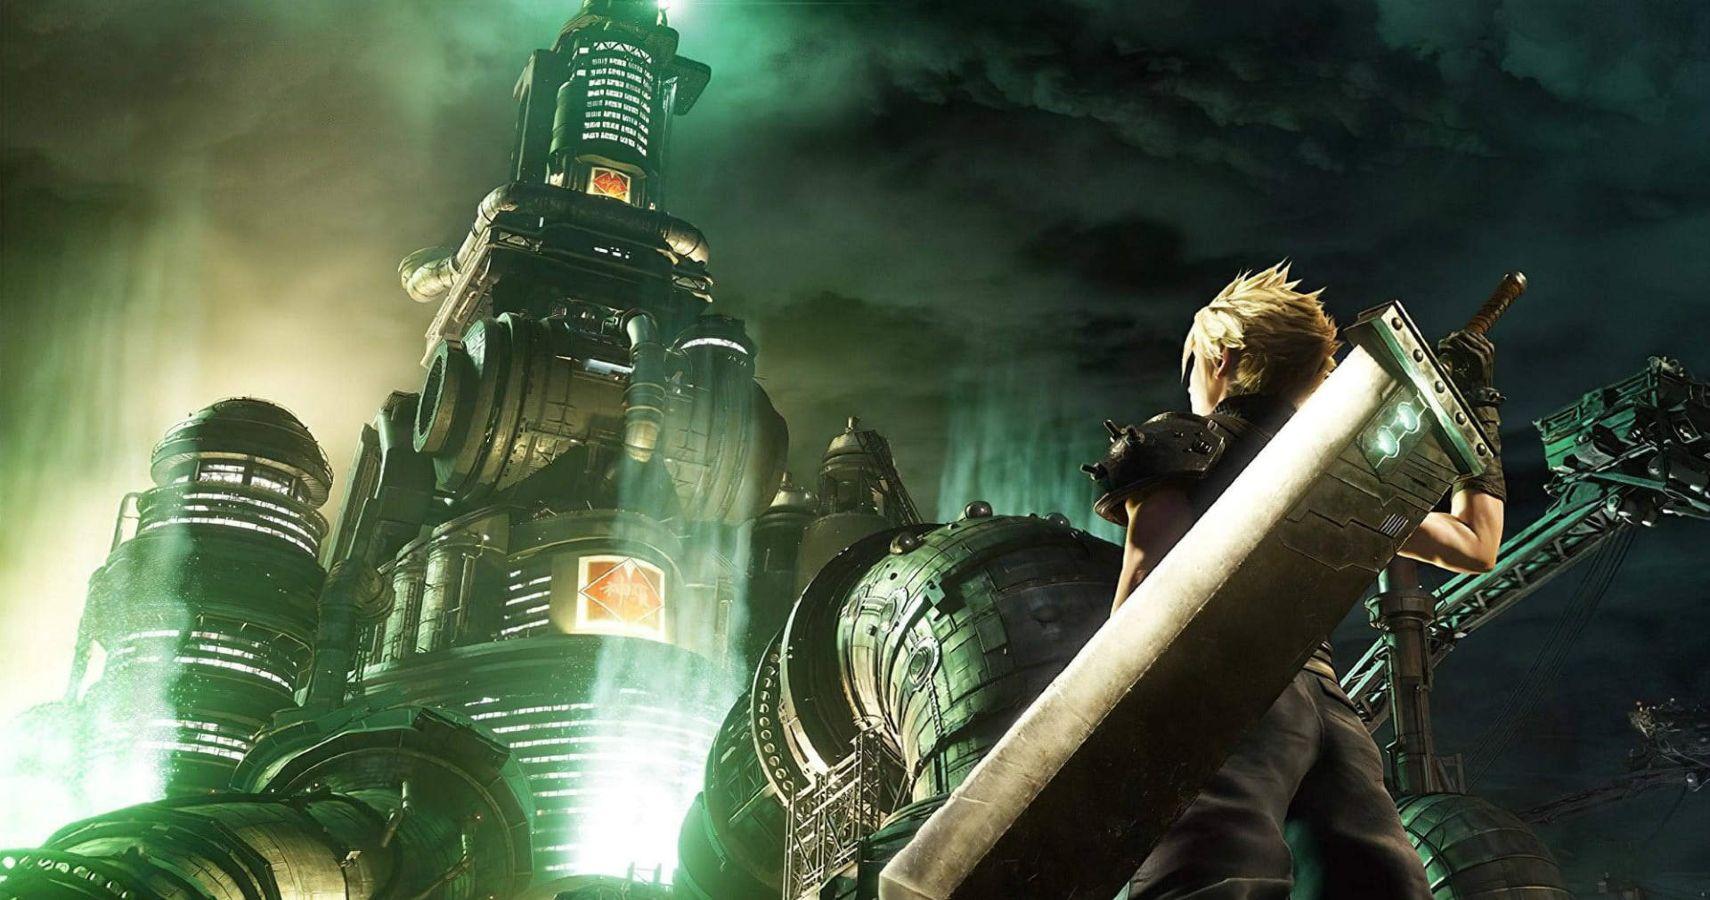 Final Fantasy 7 Remake-k lur berria du!